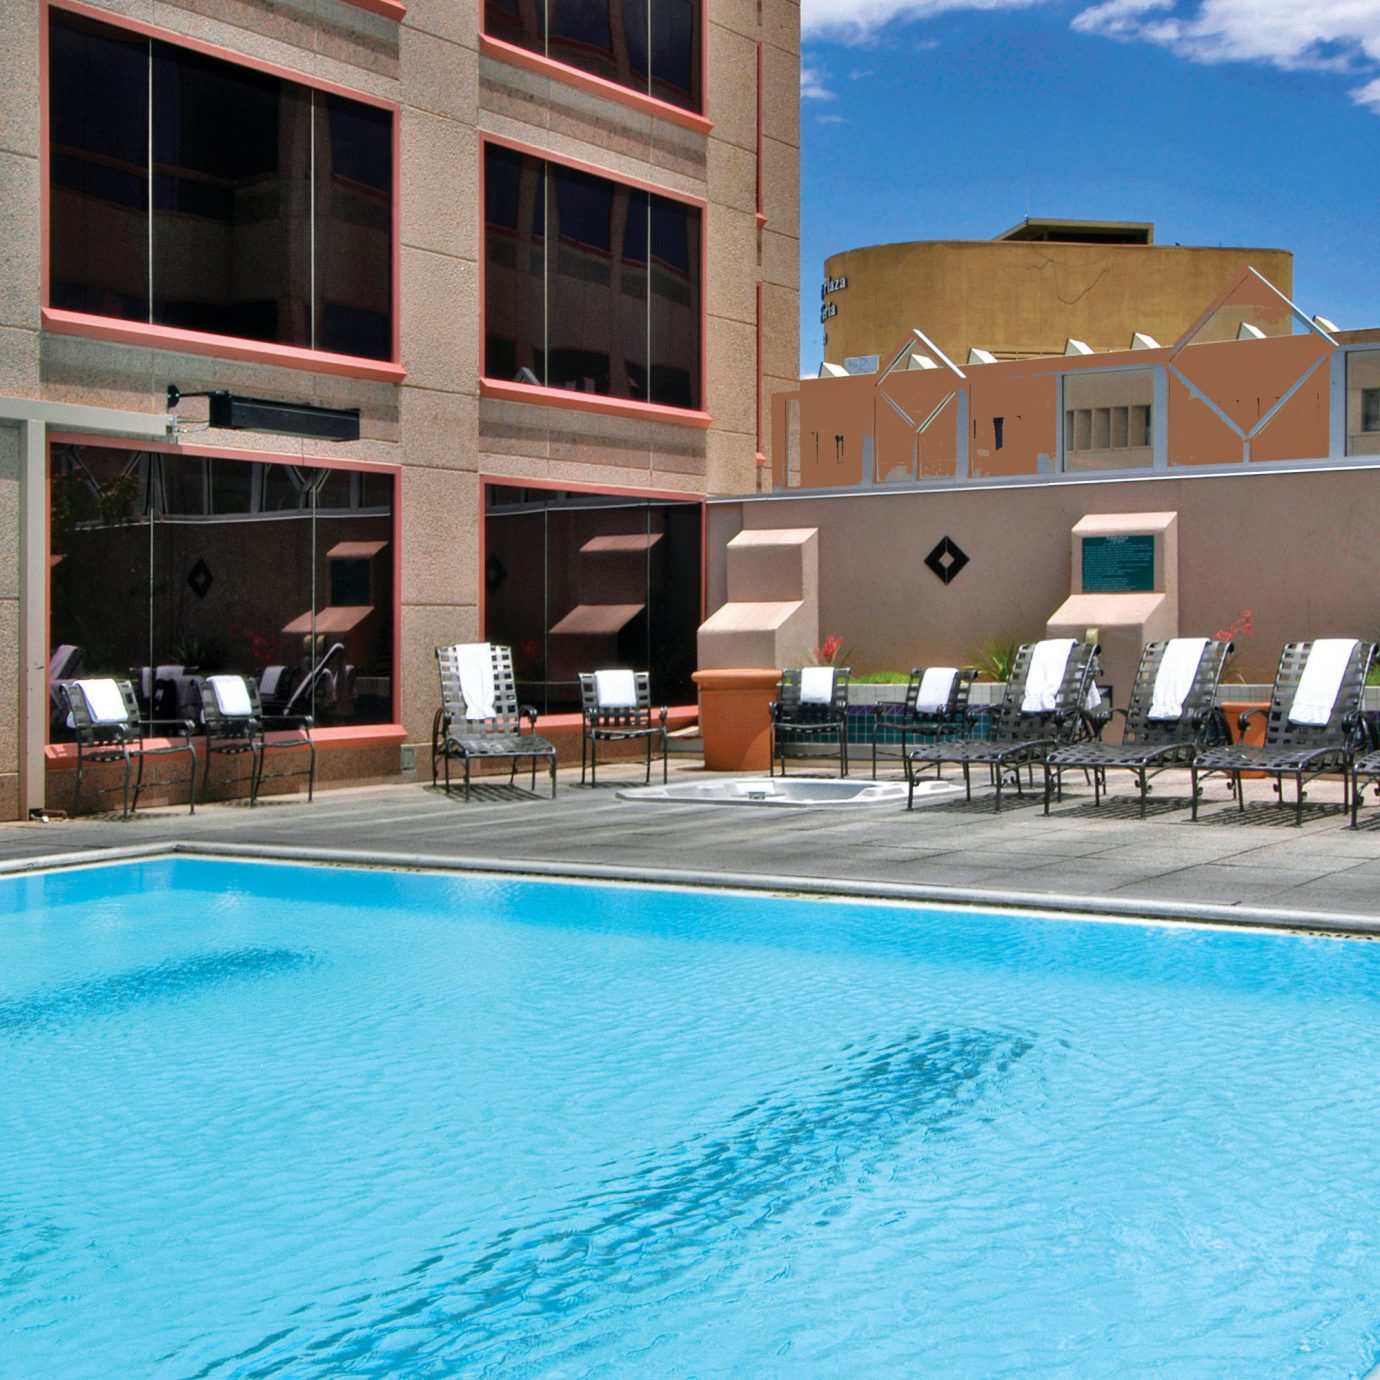 Business Classic Deck Lounge Patio Pool building water swimming swimming pool leisure property Resort water sport condominium leisure centre blue Villa